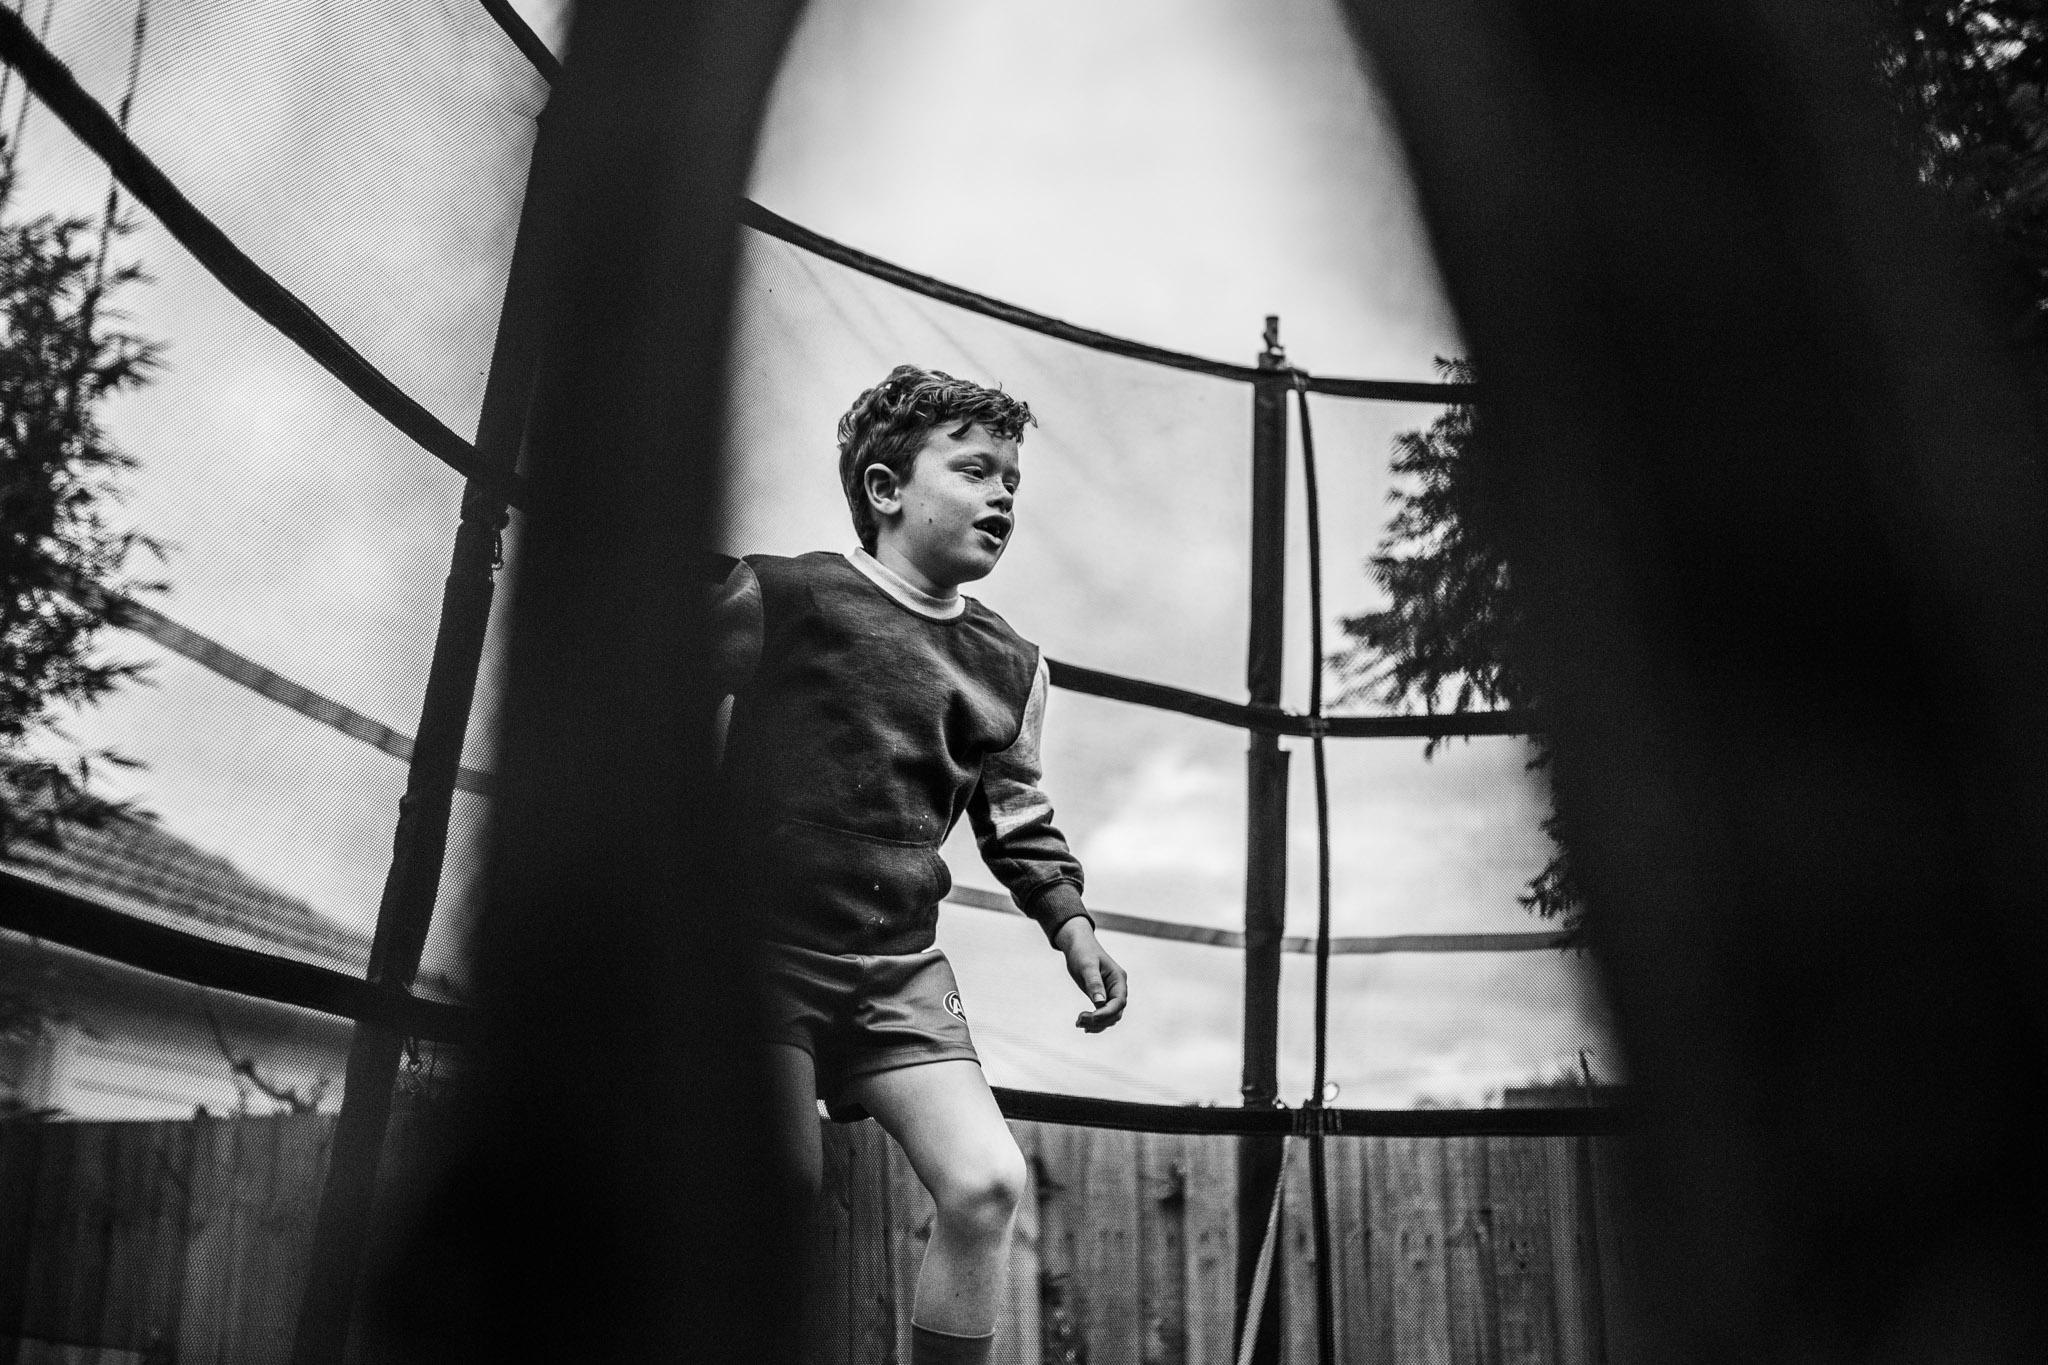 Boy on trampoline.